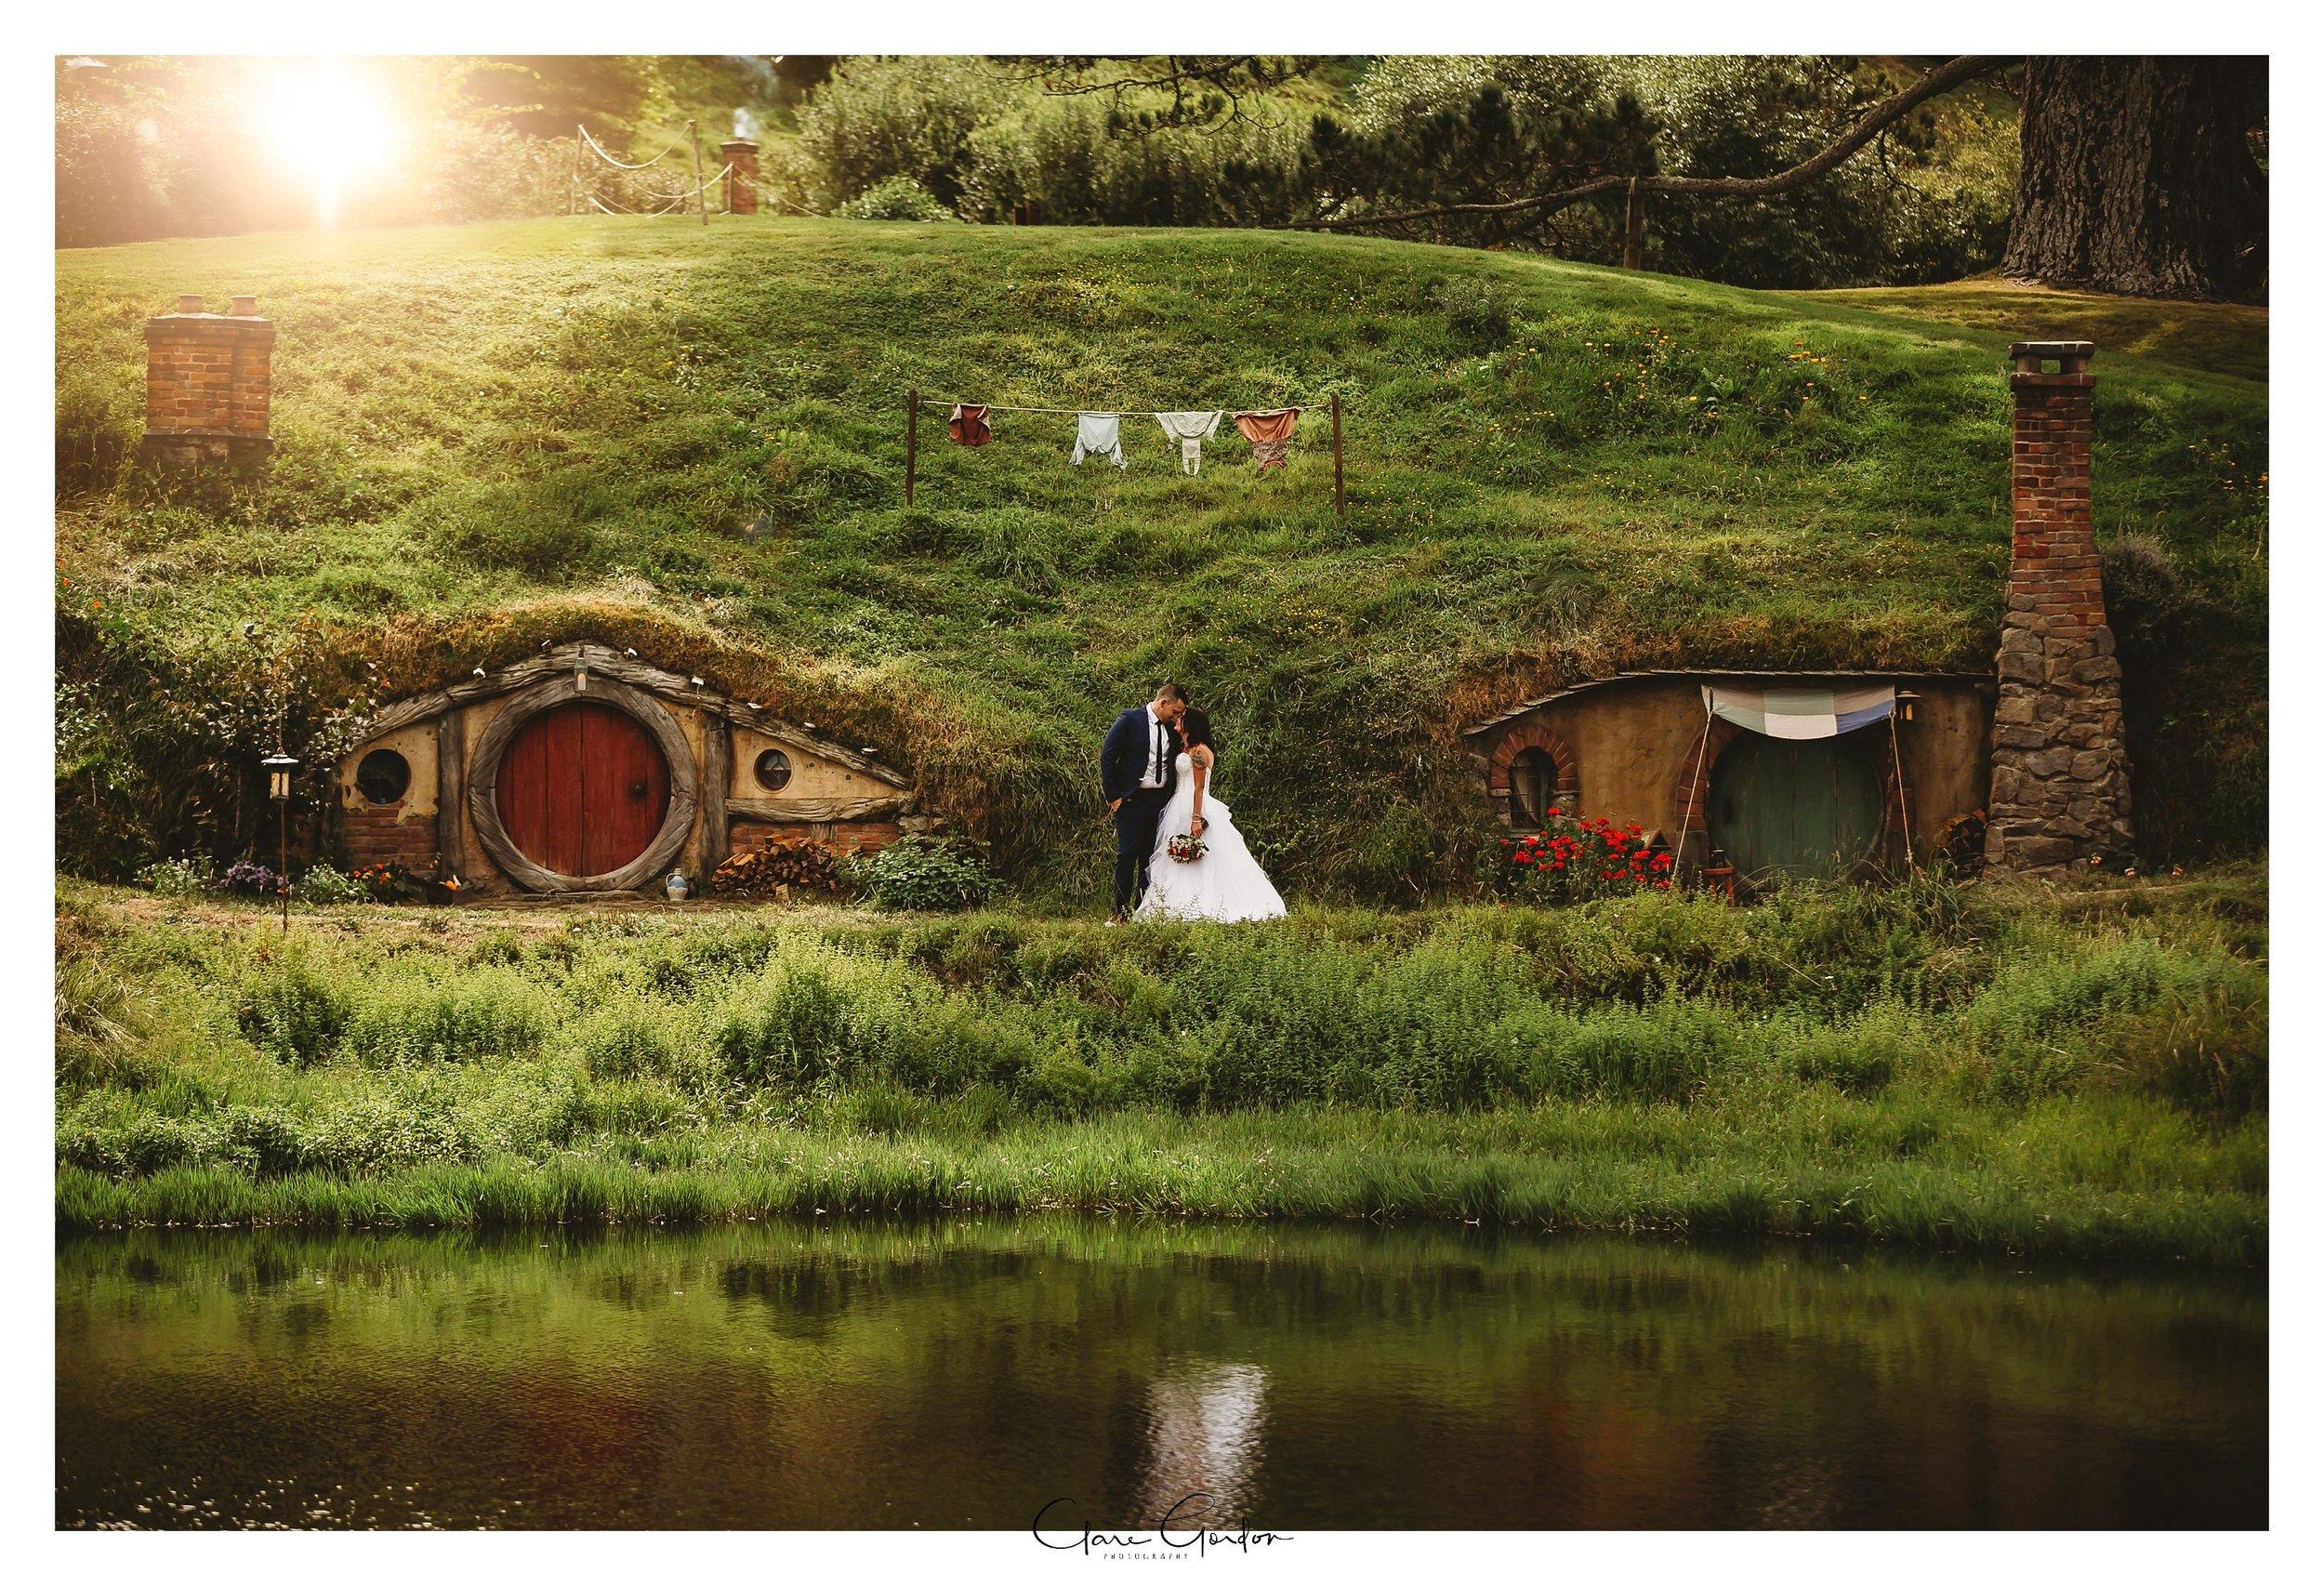 Hobbtion-wedding-photo-bride-and-groom-by-lake